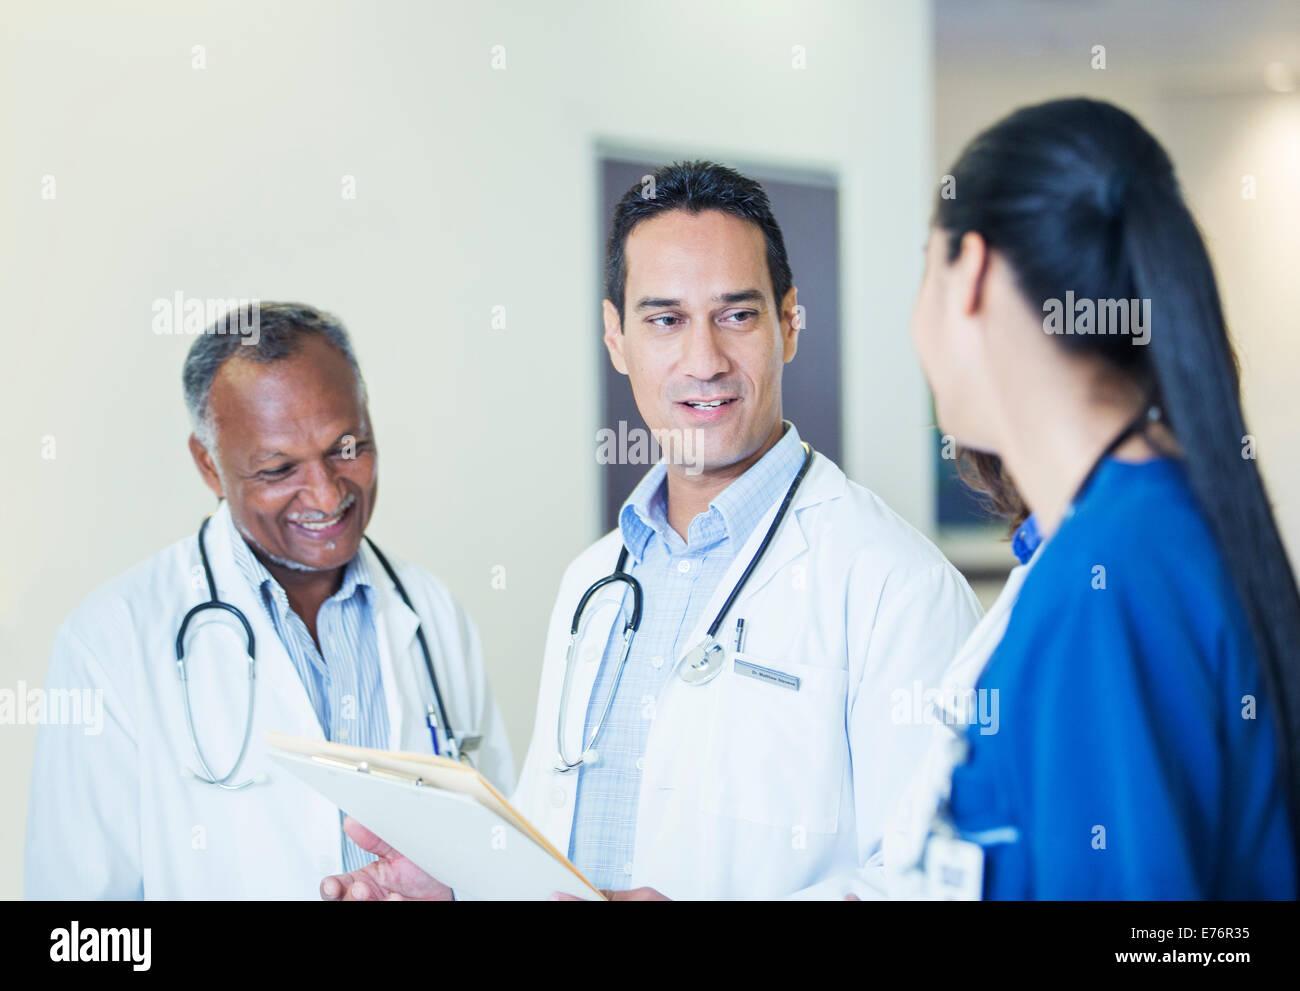 Doctors and nurse talking in hospital hallway - Stock Image